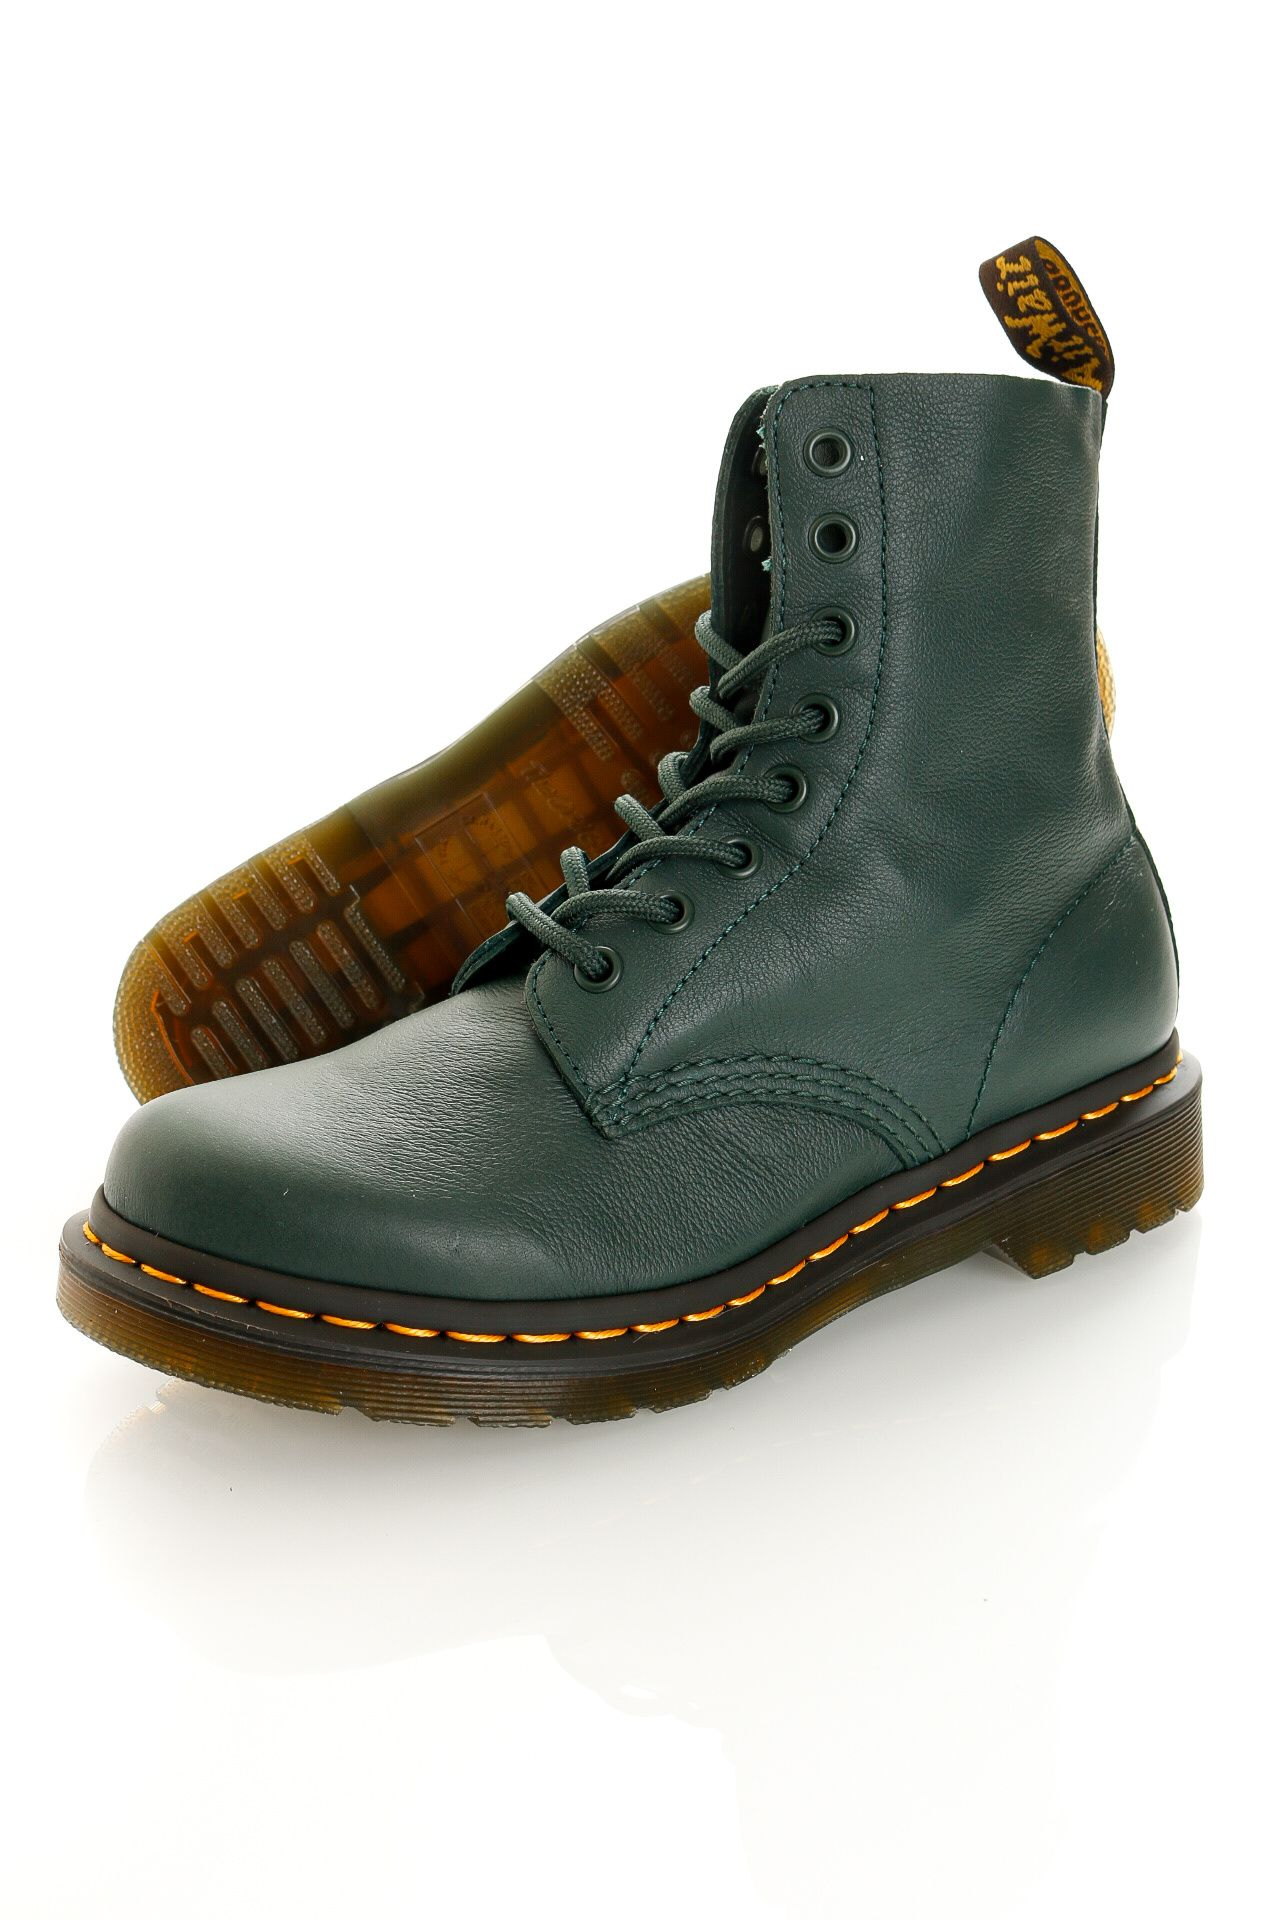 Afbeelding van Dr.Martens Boots 1460 Pascal Pine Green Virginia 26902328